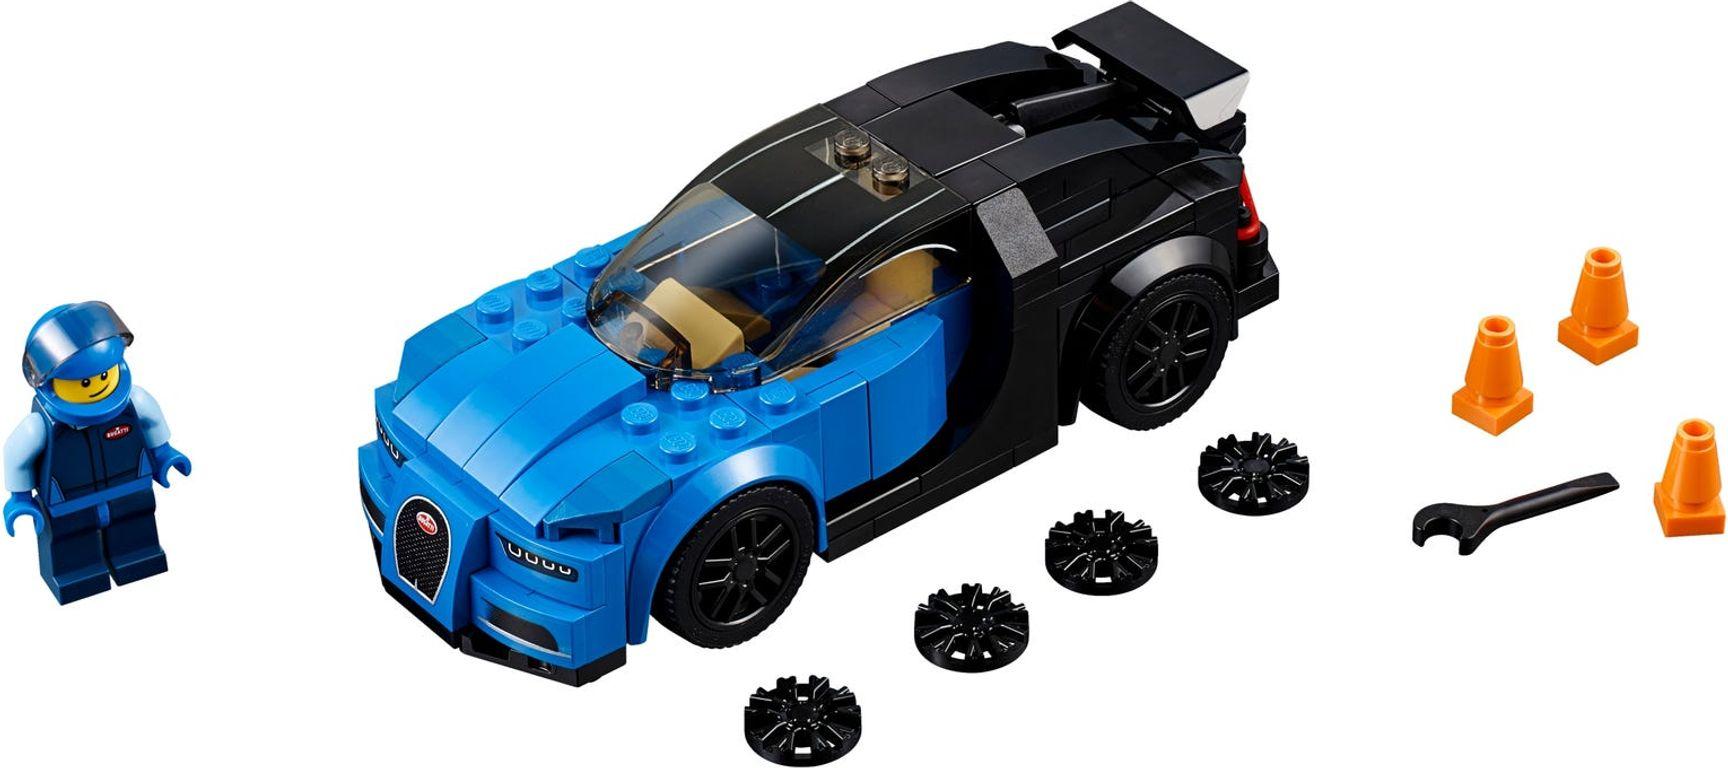 LEGO® Speed Champions Bugatti Chiron components